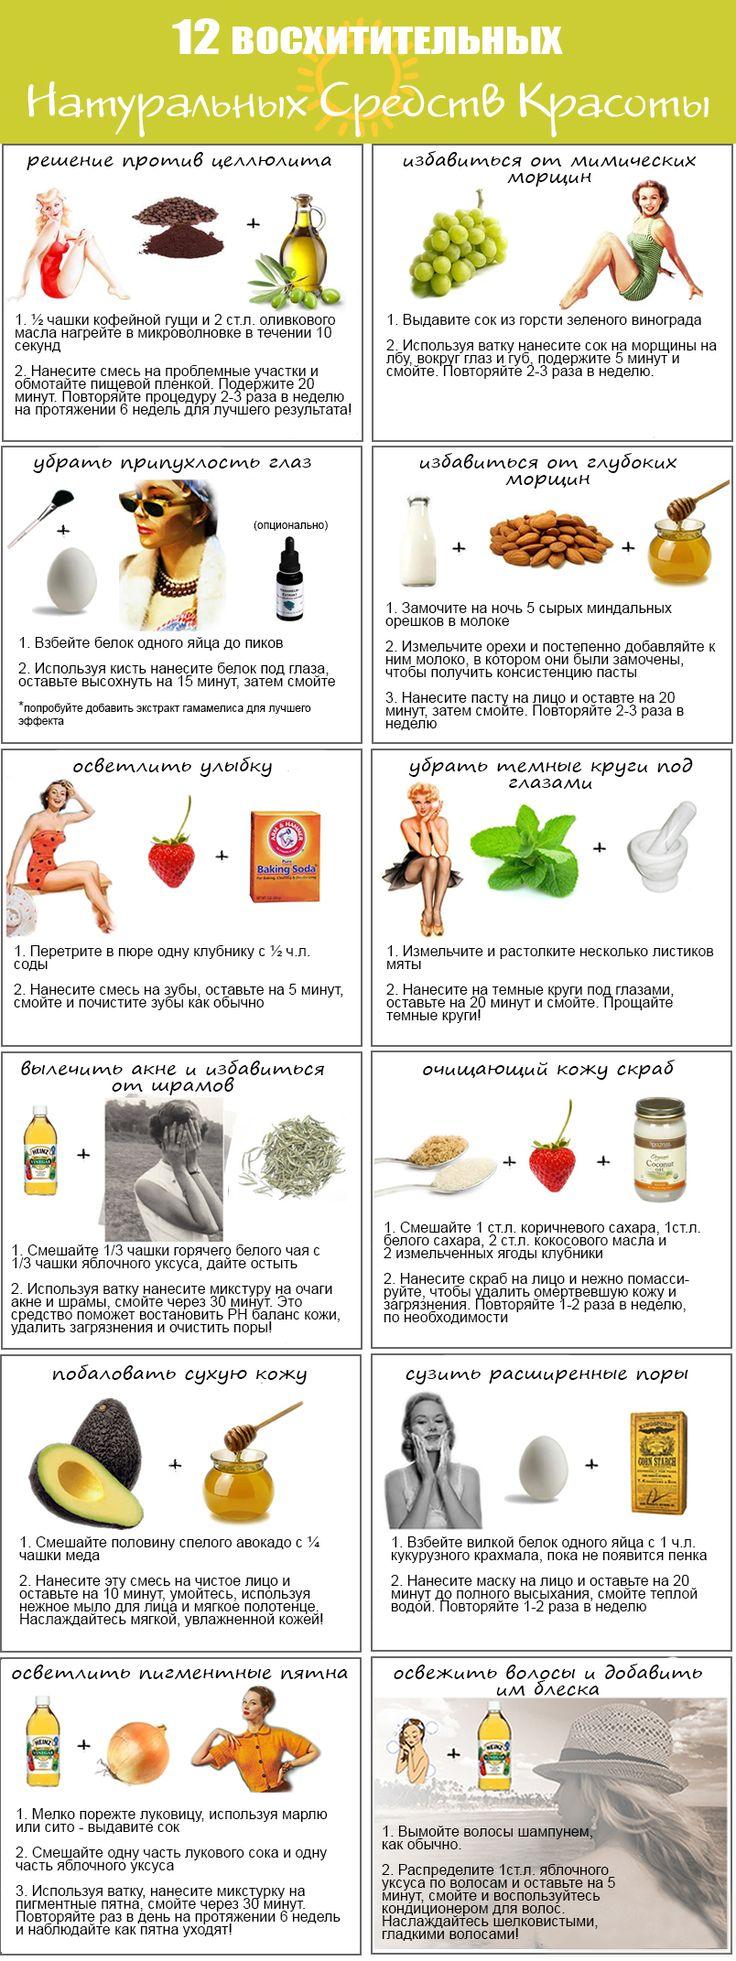 Натуральные рецепты красоты